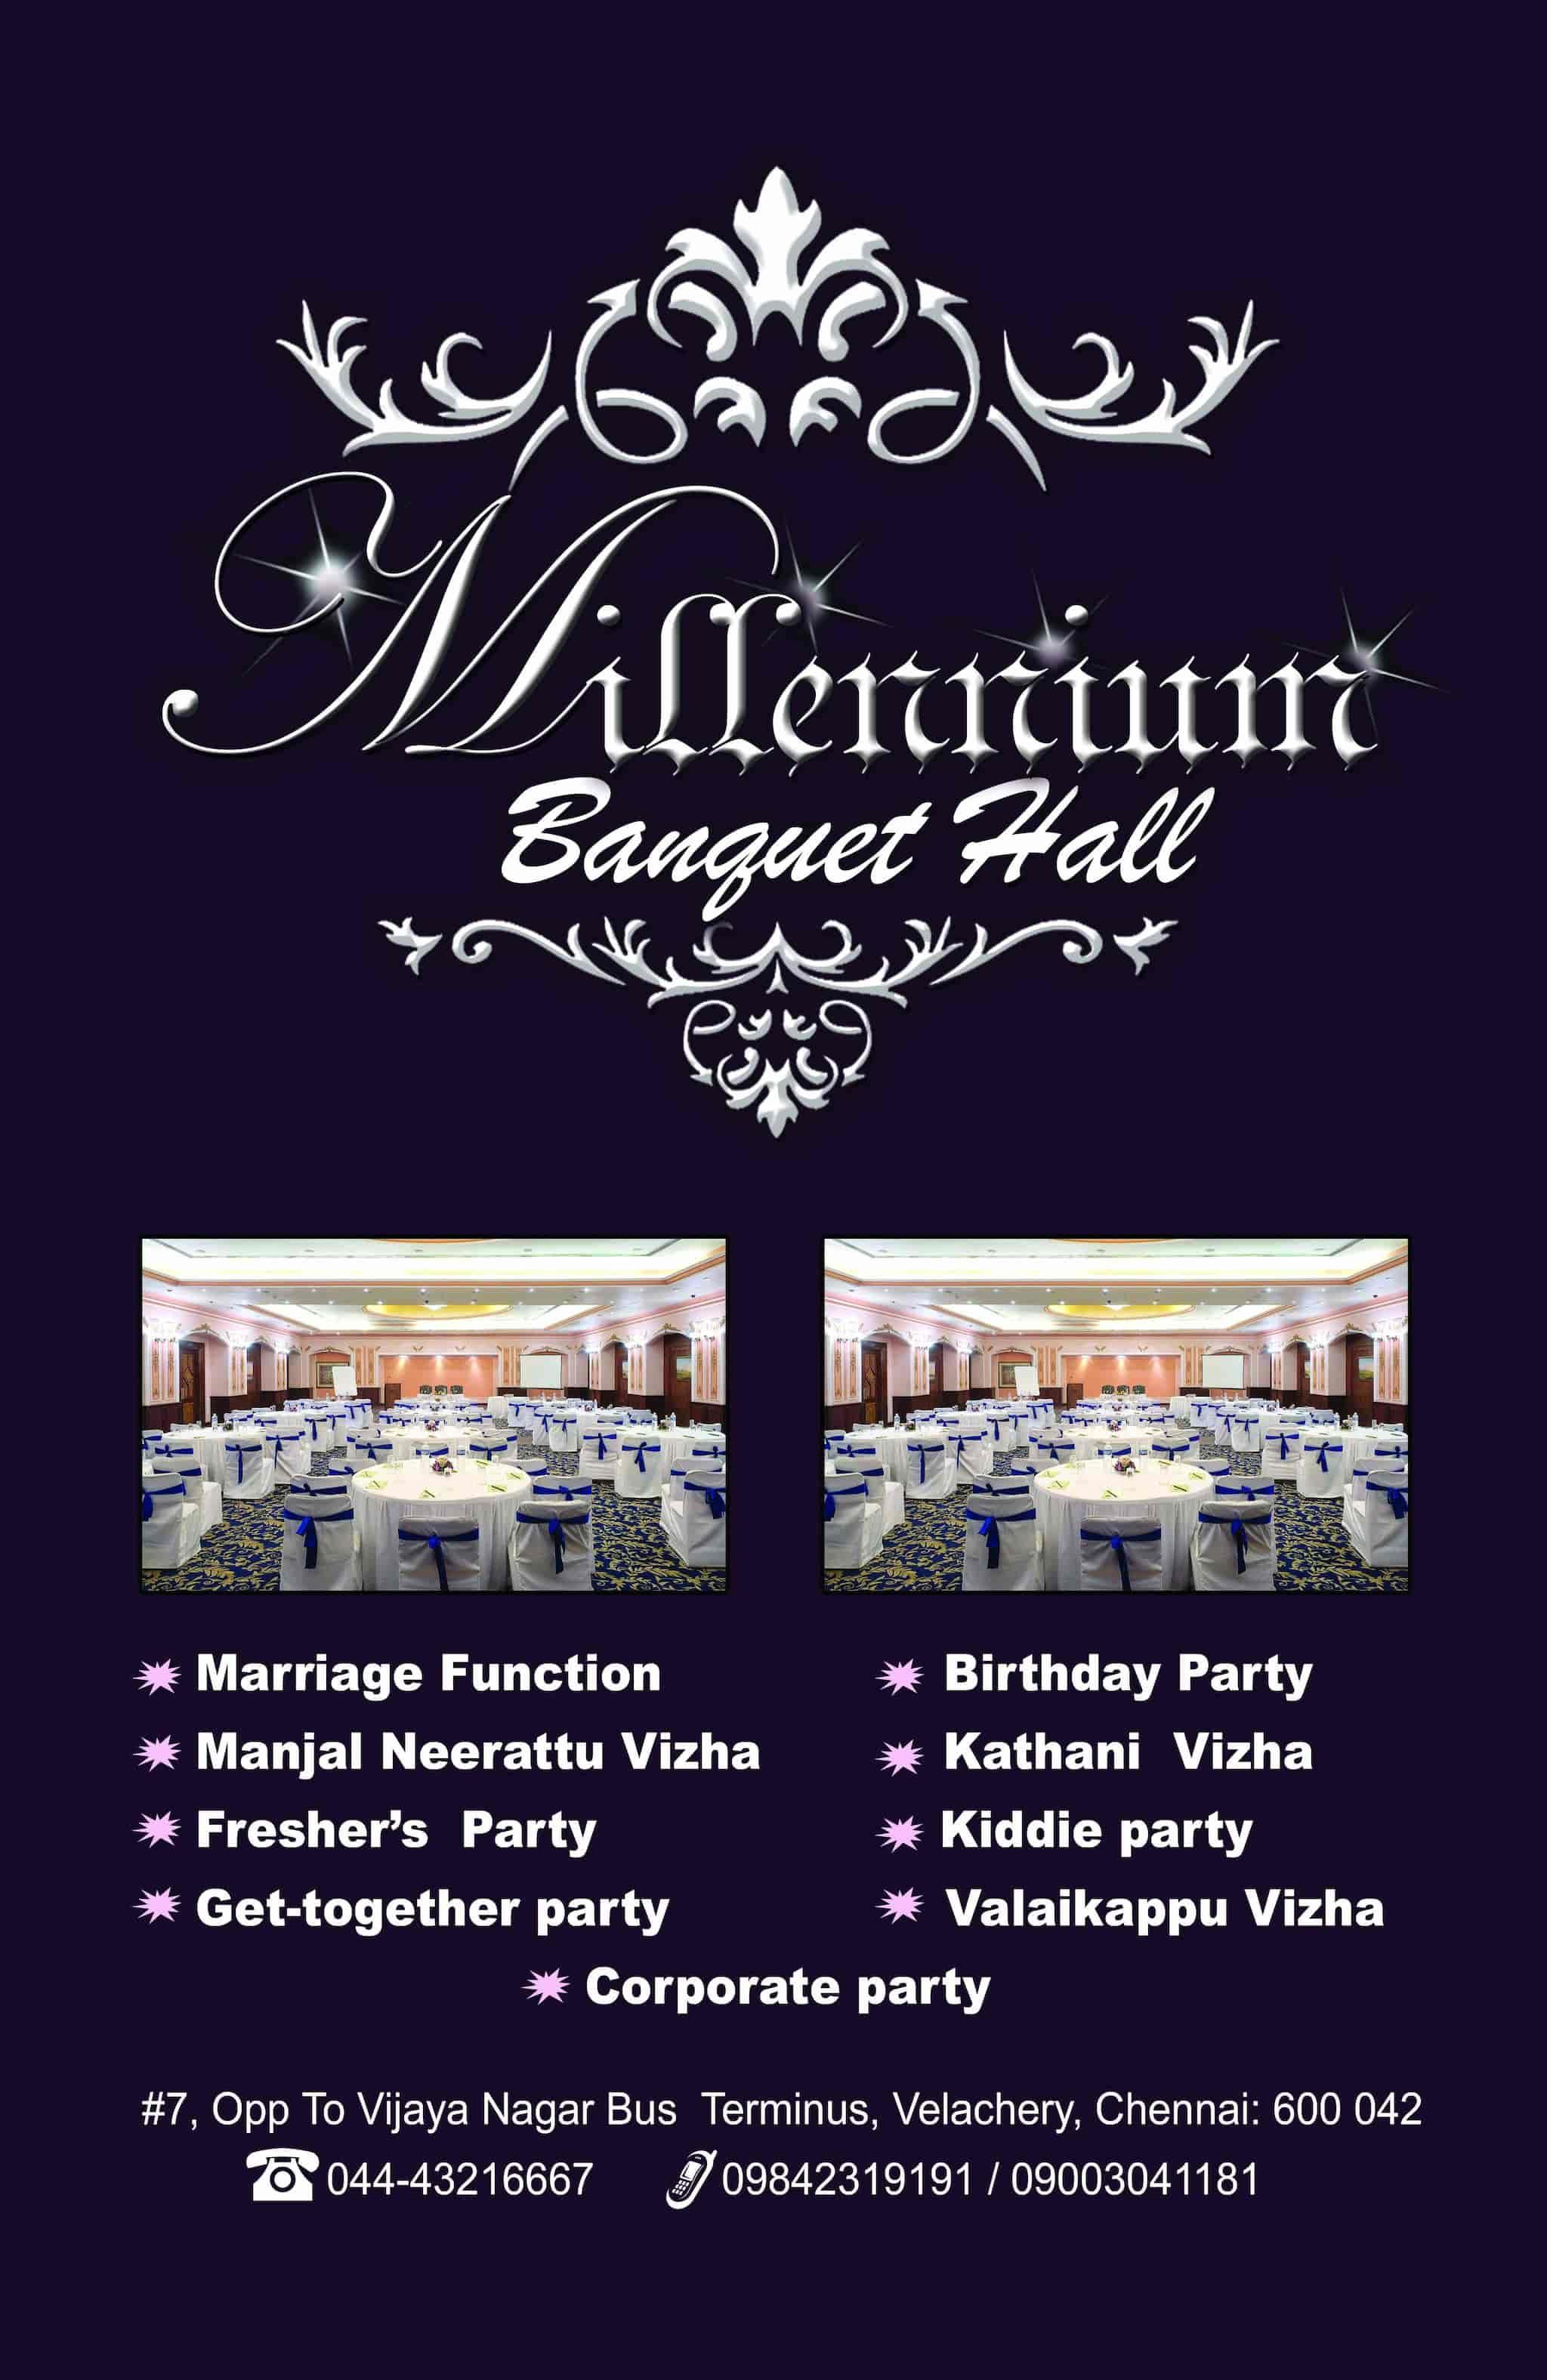 millennium banquet hall closed down in velacheri chennai justdial